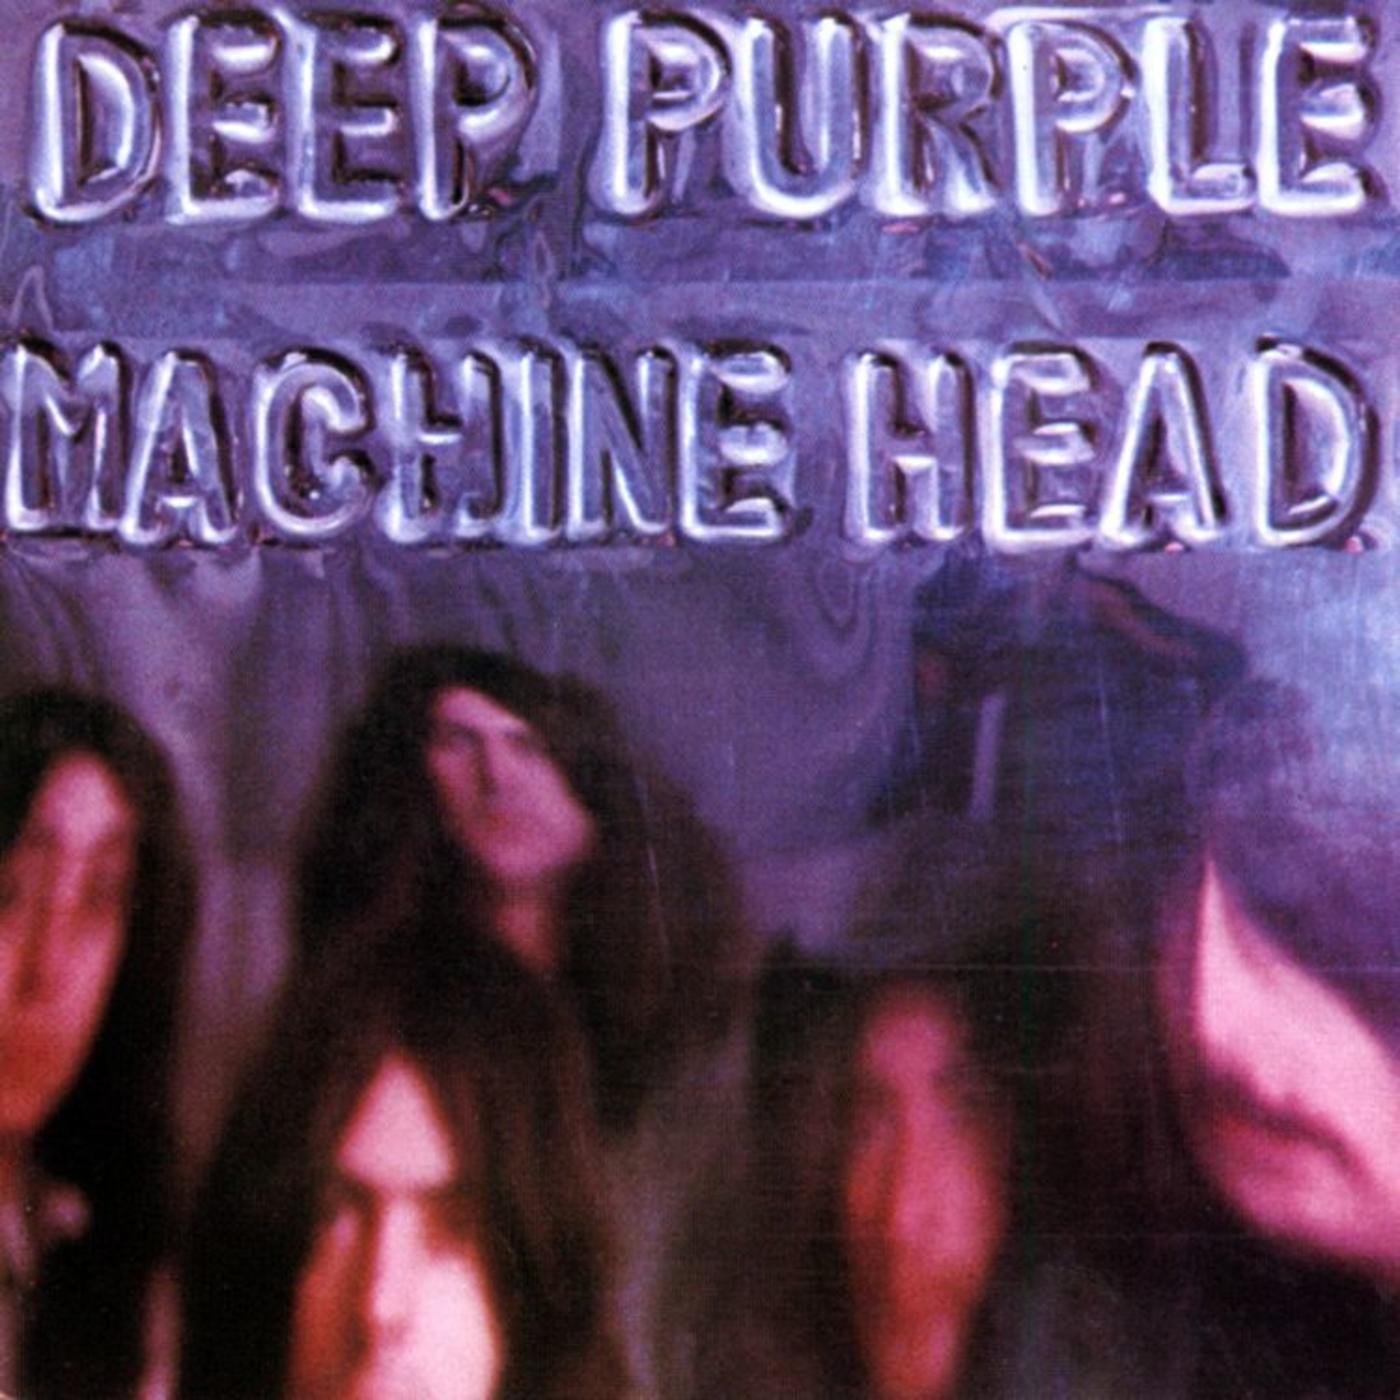 Deep Purple - The Complete Albums 1970-1976   Rhino